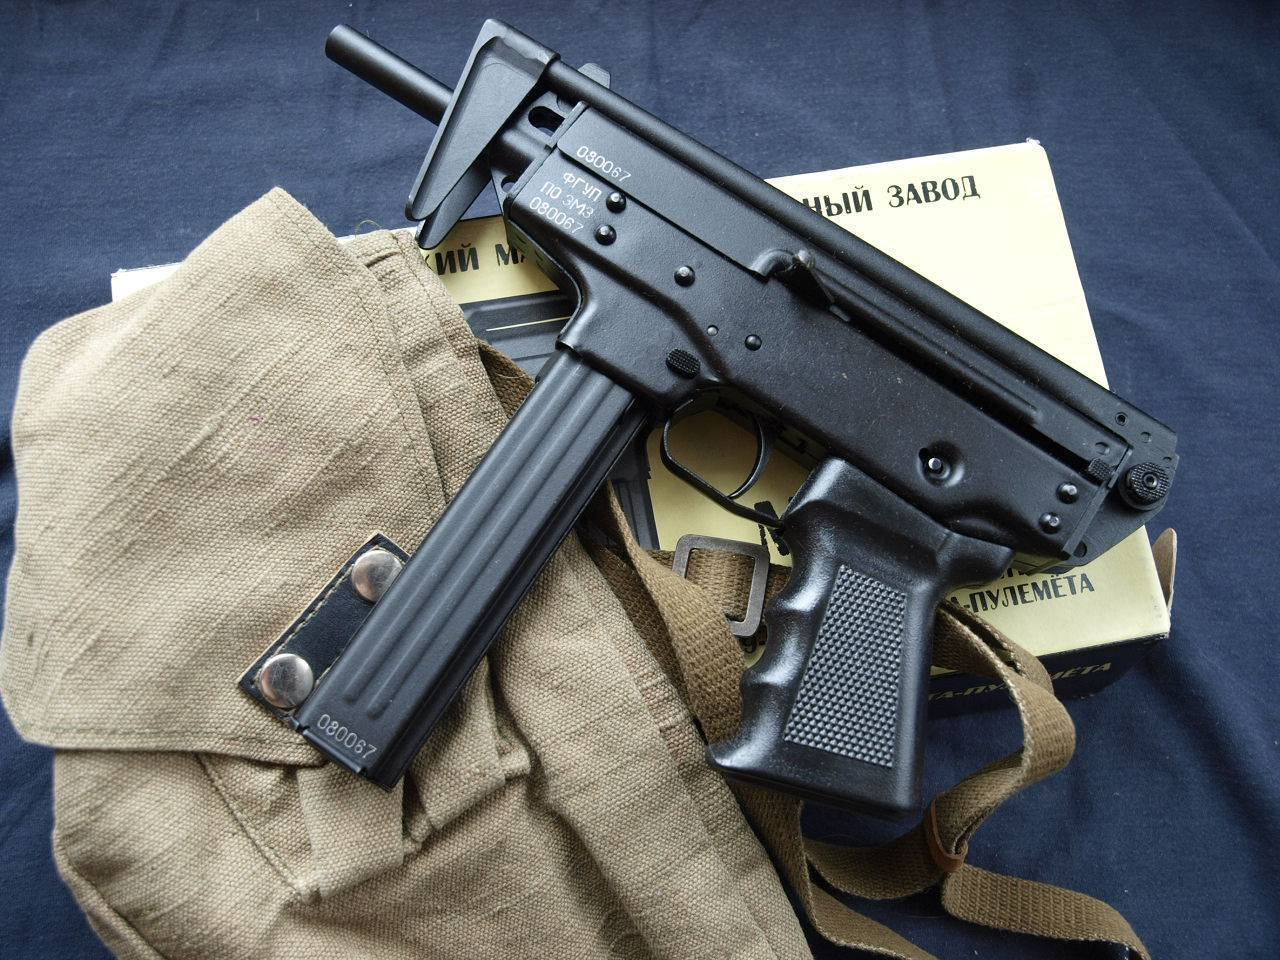 Пистолет-пулемет fmk-3 (аргентина) | армии и солдаты. военная энциклопедия